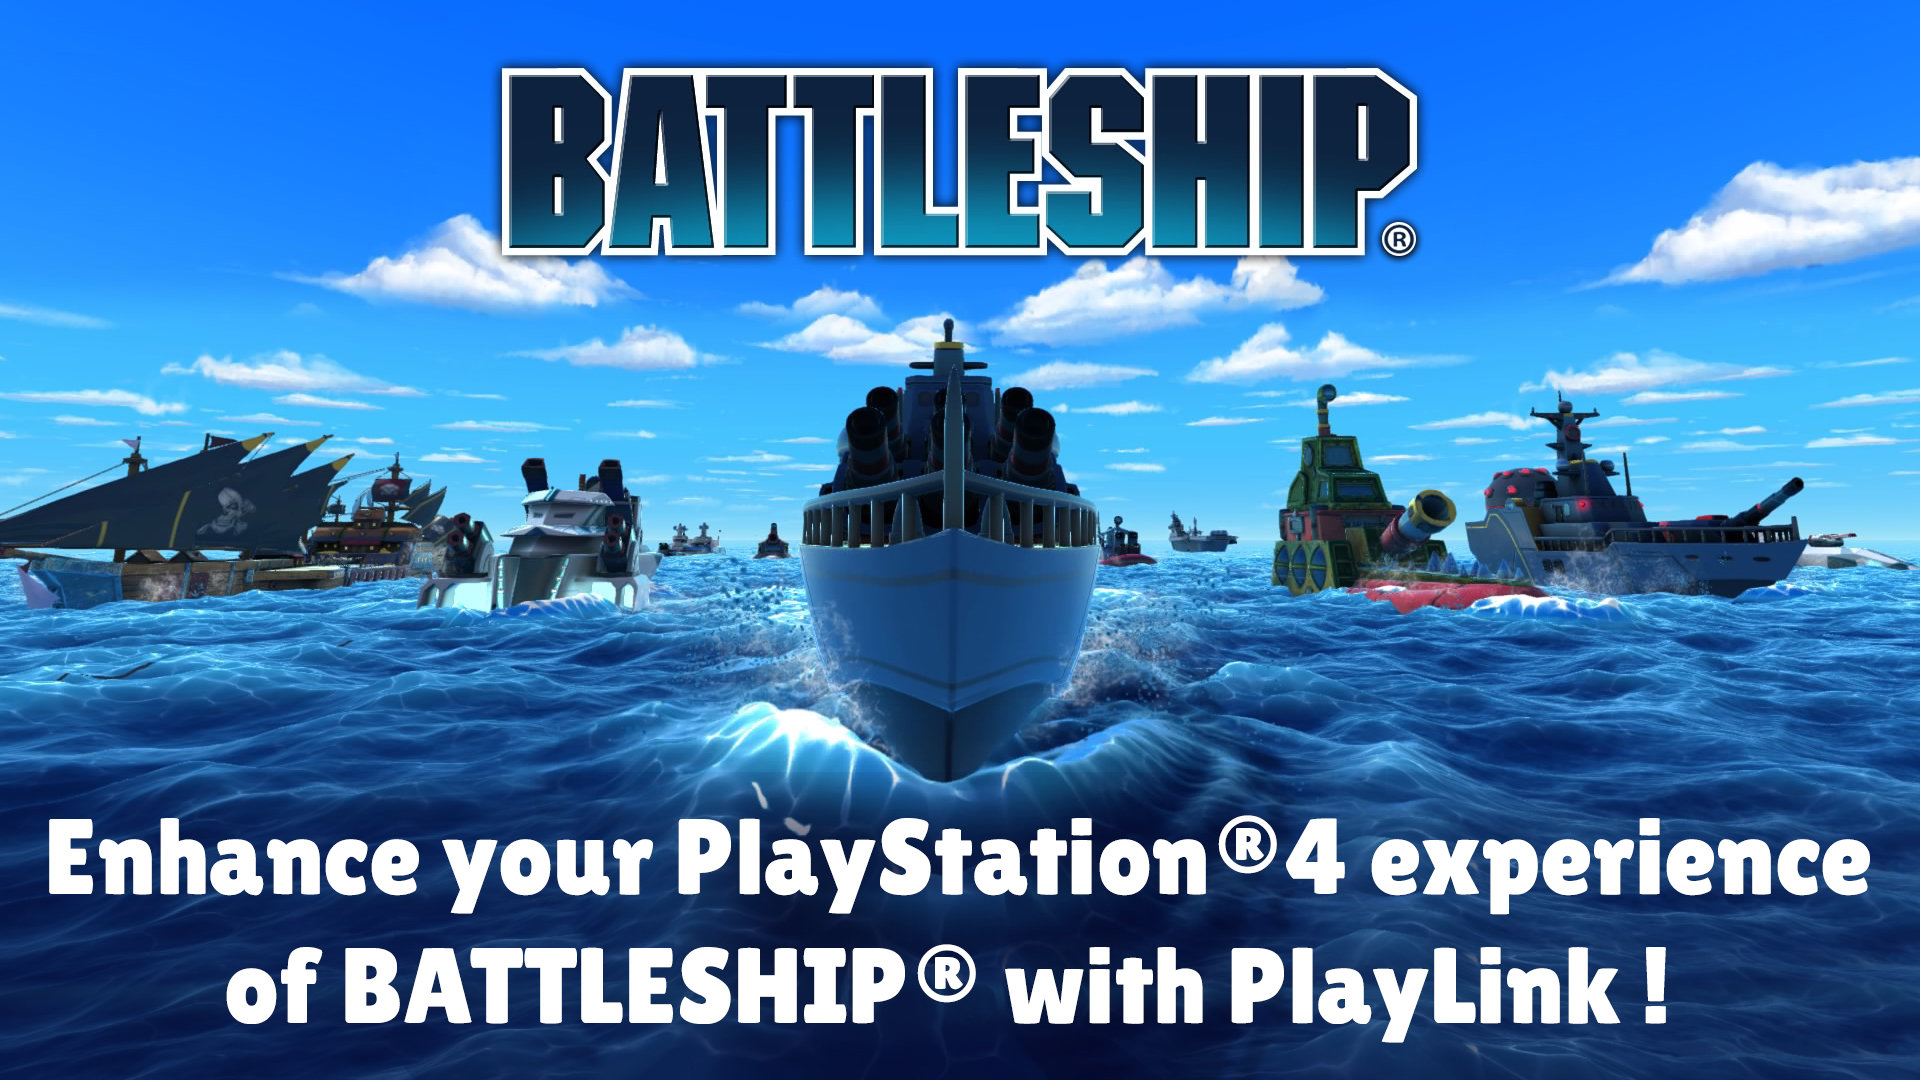 BATTLESHIP Playlink Game   PS4 - PlayStation